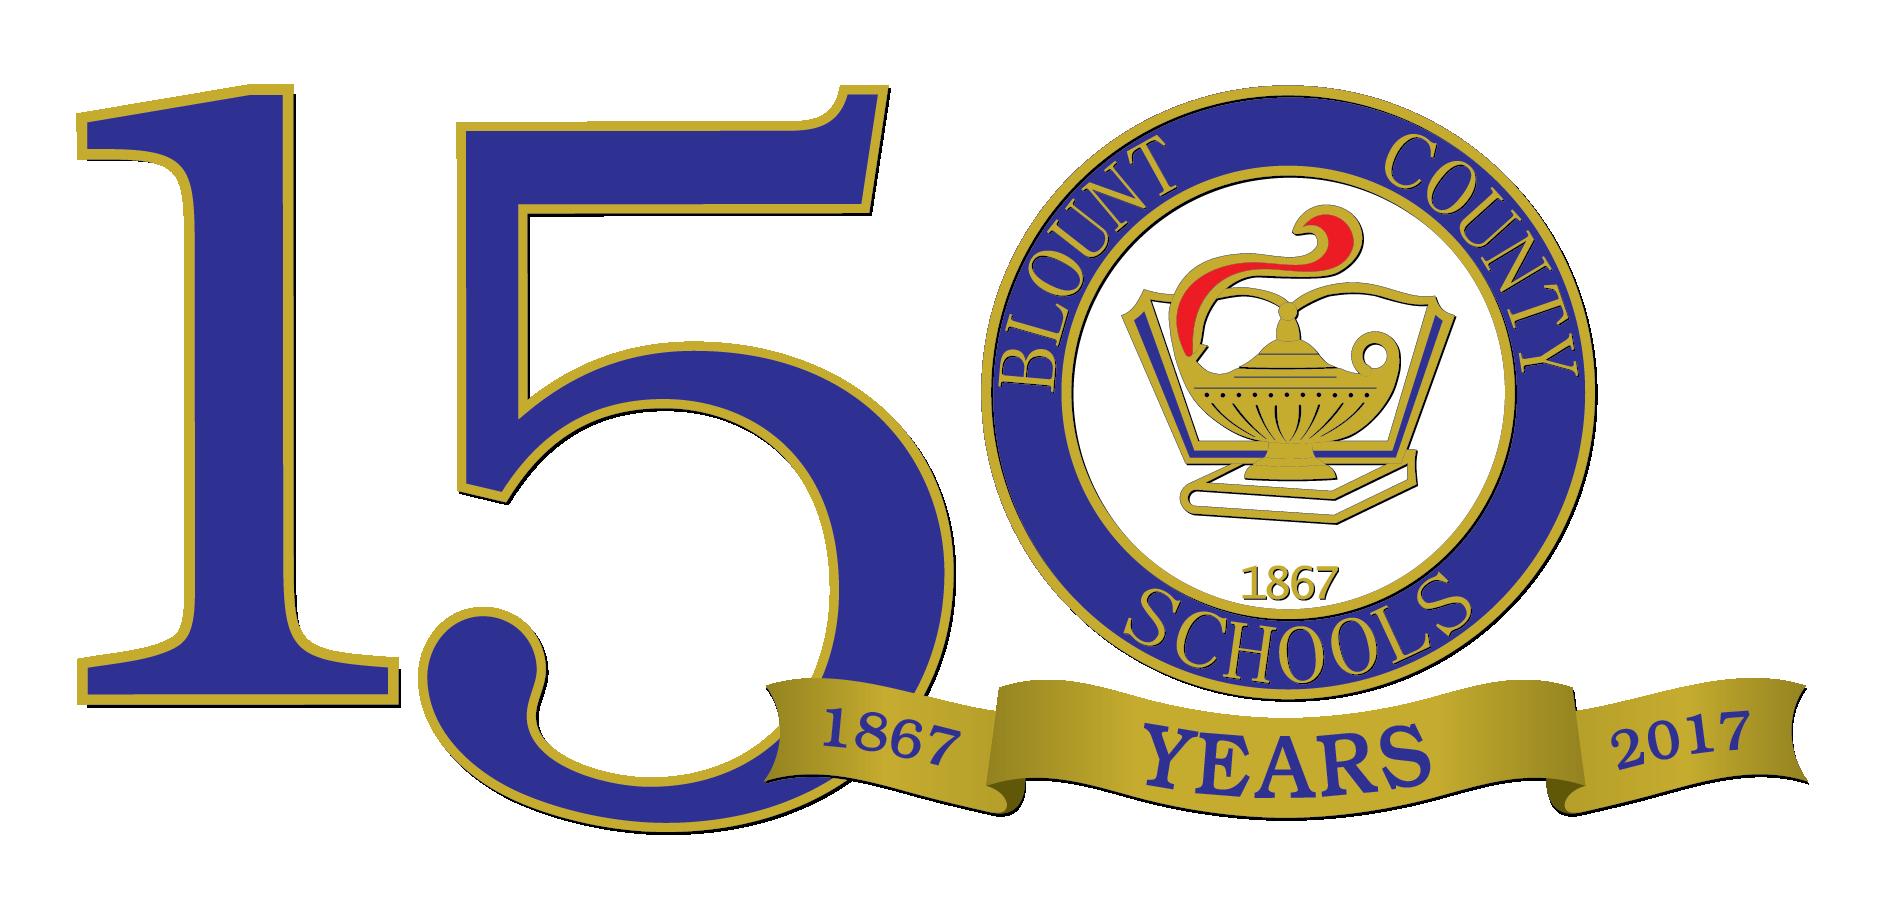 Blount County Schools 150th anniversary logo